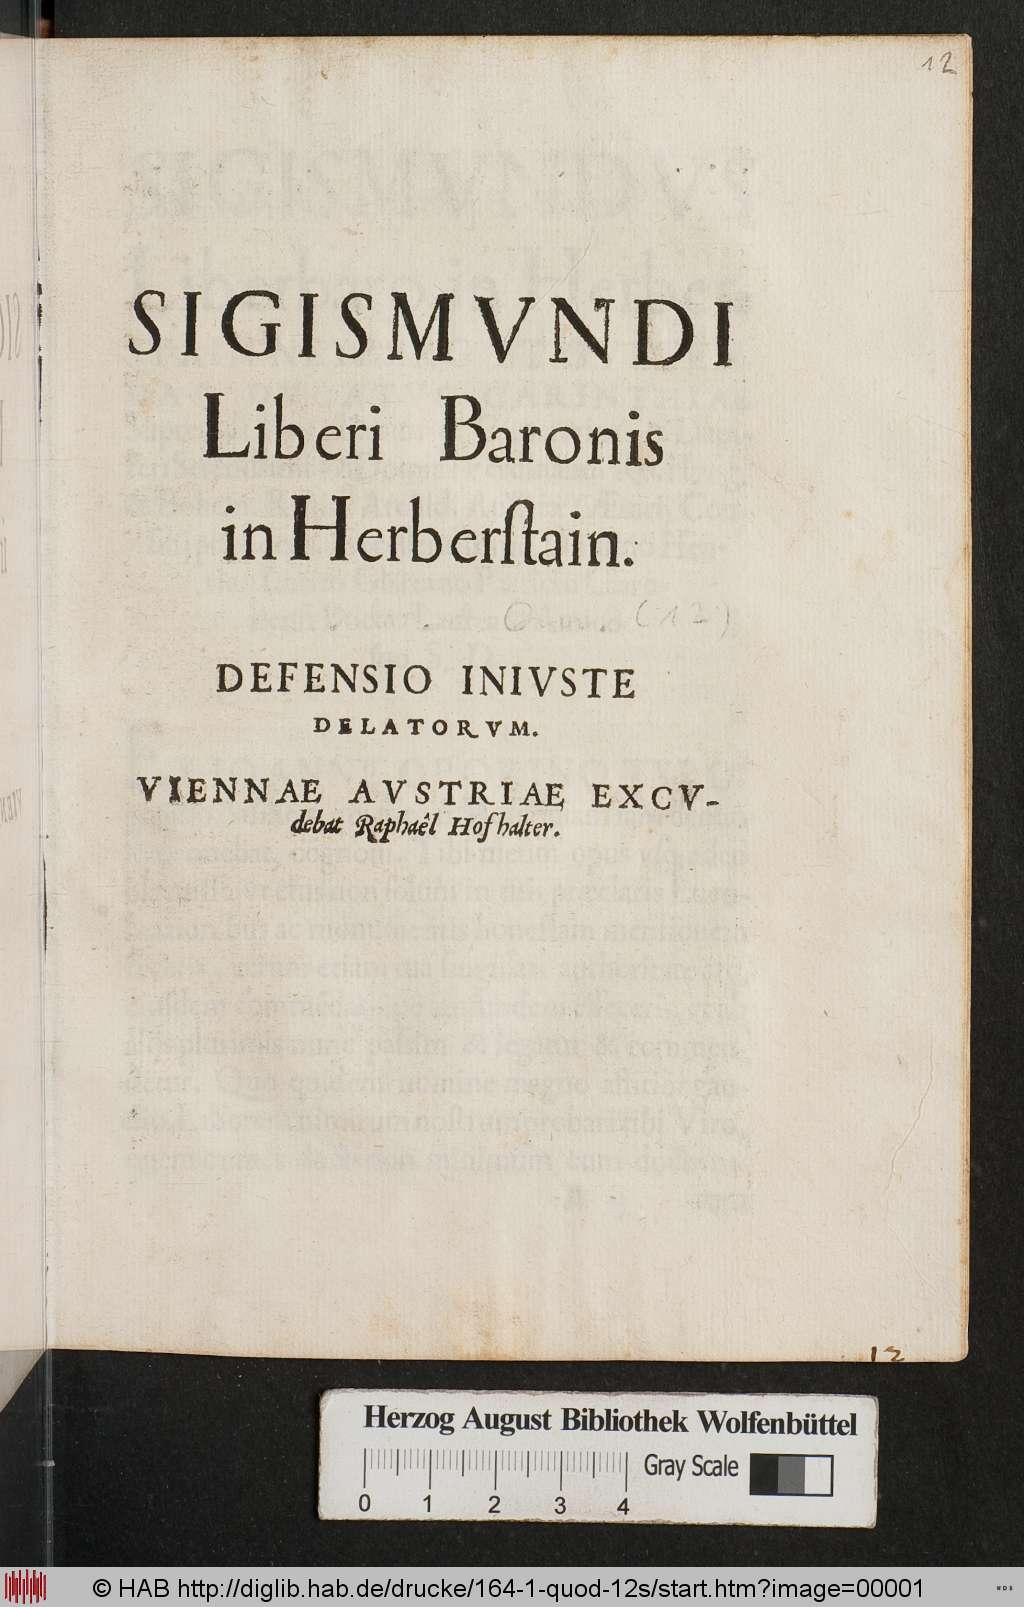 http://diglib.hab.de/drucke/164-1-quod-12s/00001.jpg